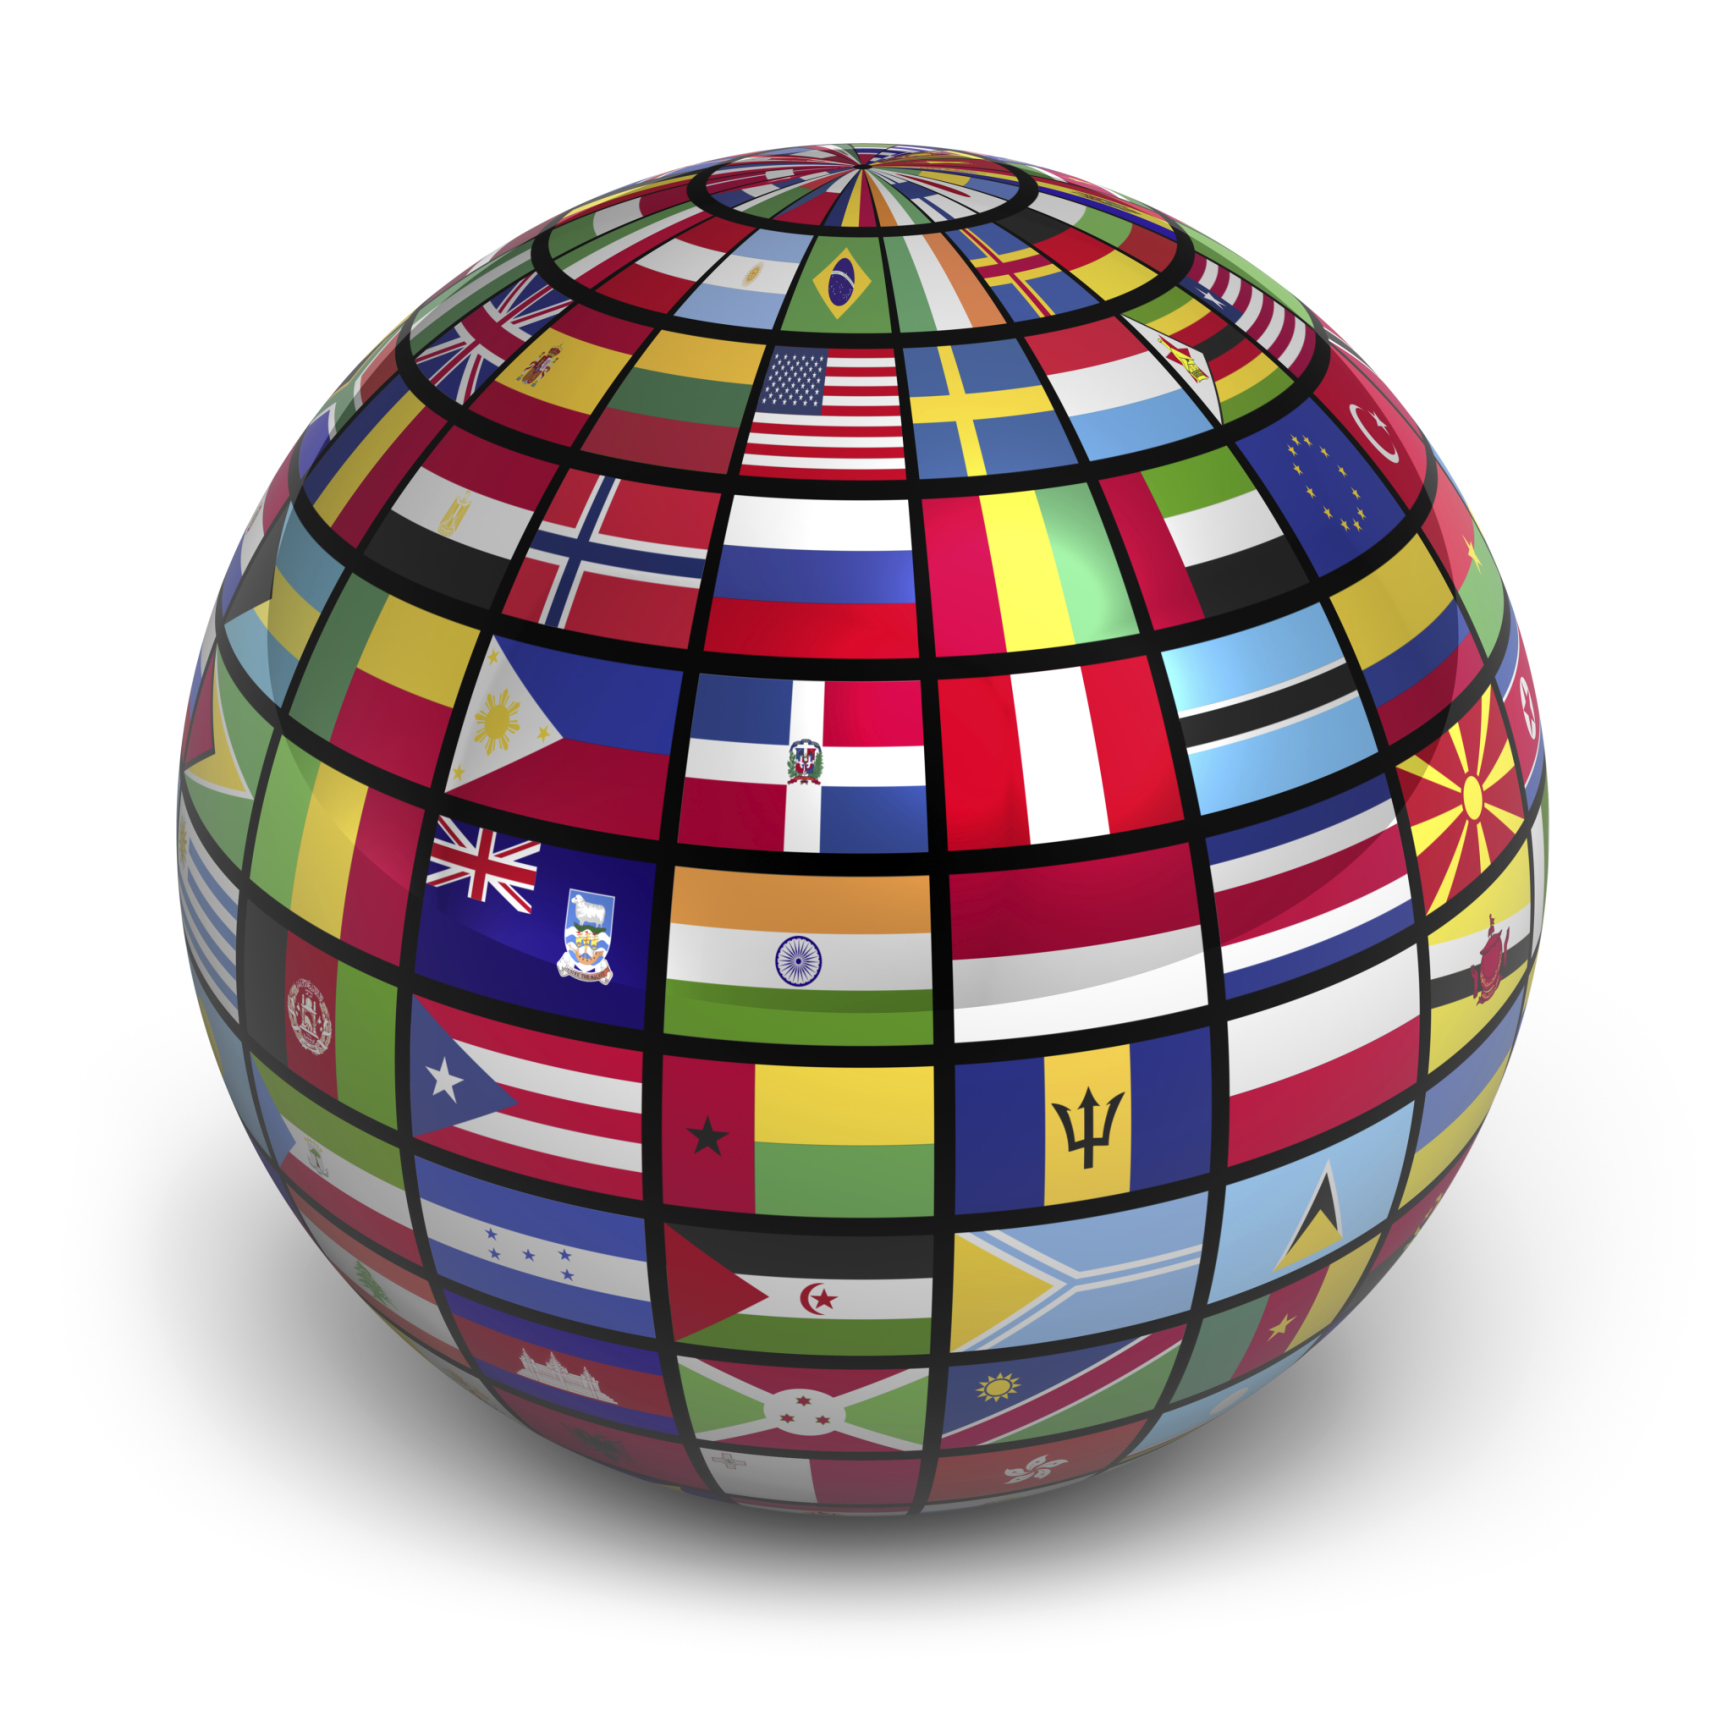 Market World: International Trade Assistance And Information